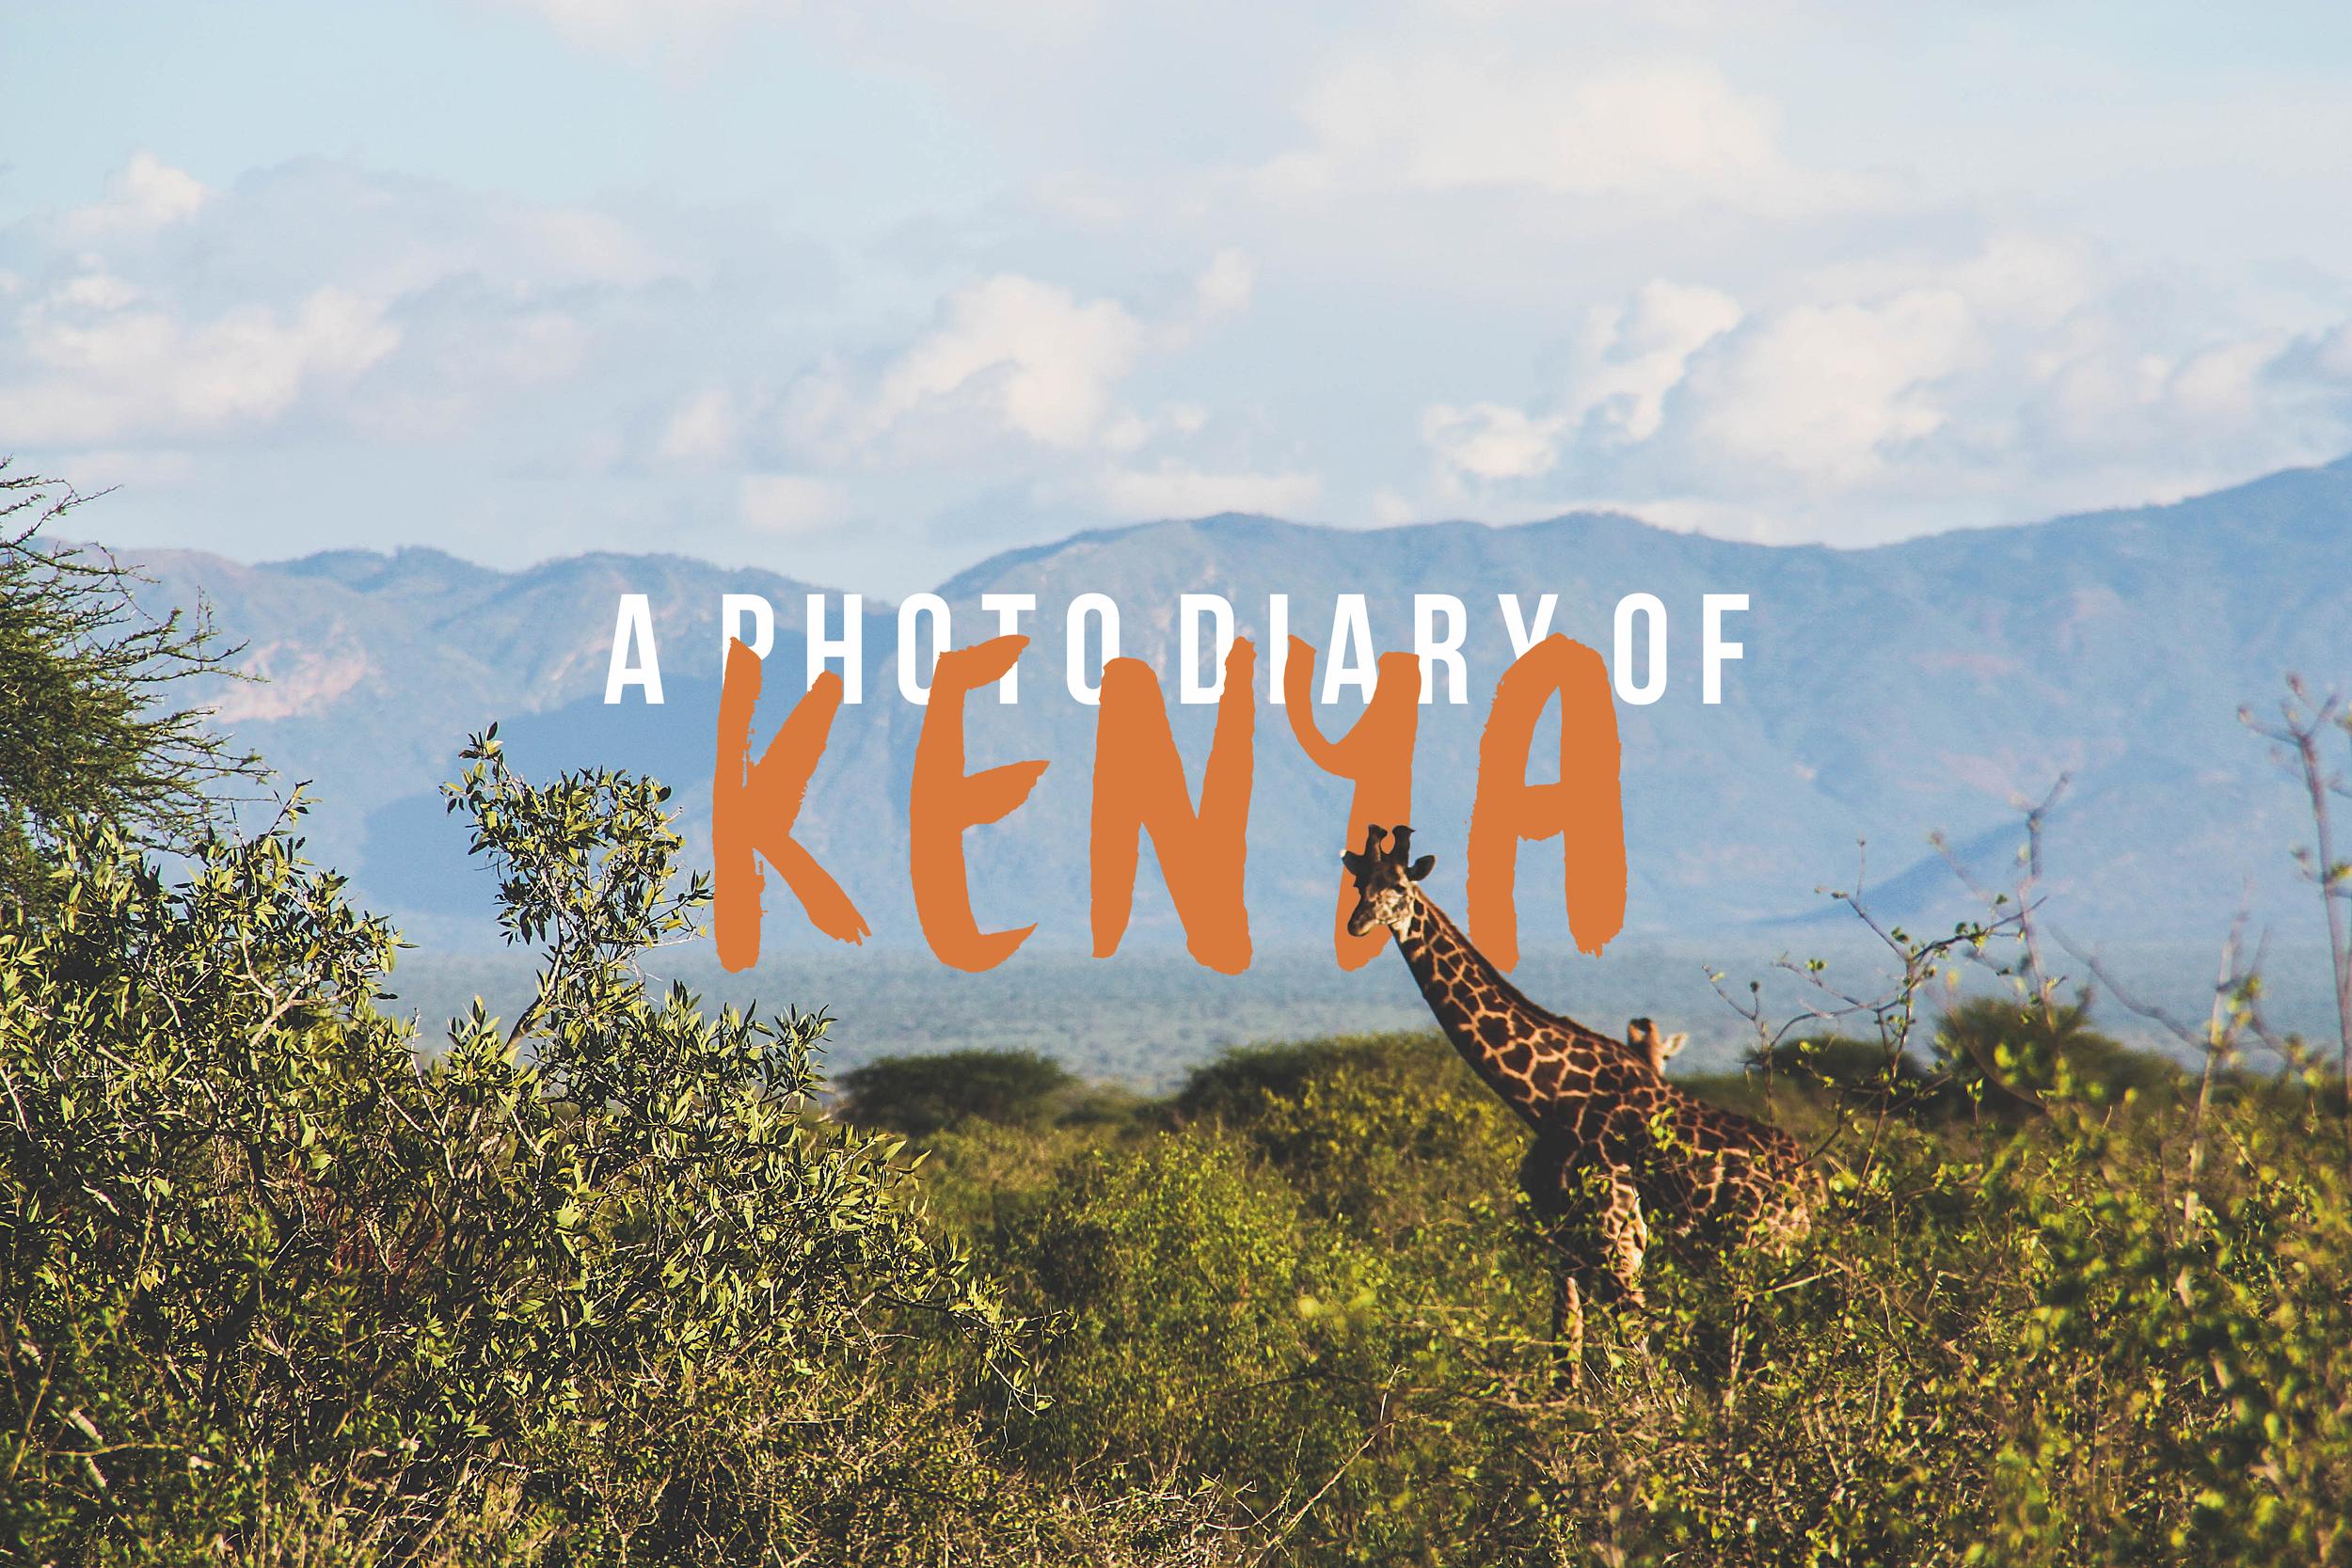 A photo diary of Kenya